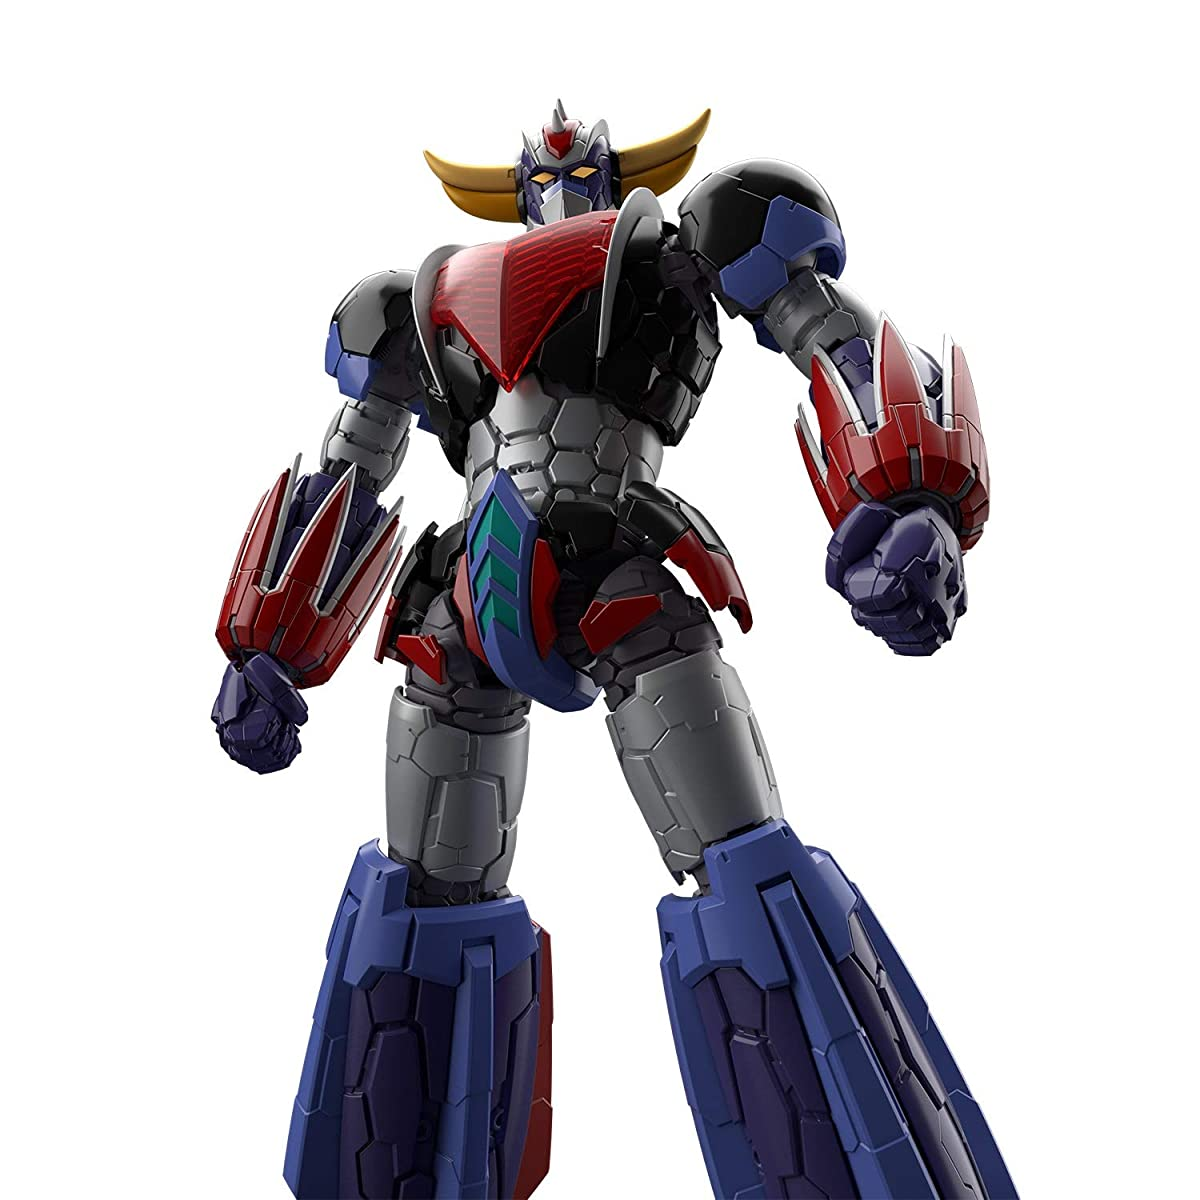 GOLDRAKE Legacy of Revoltech Grendizer Atlas Ufo Robot Kaiyodo Action Figure